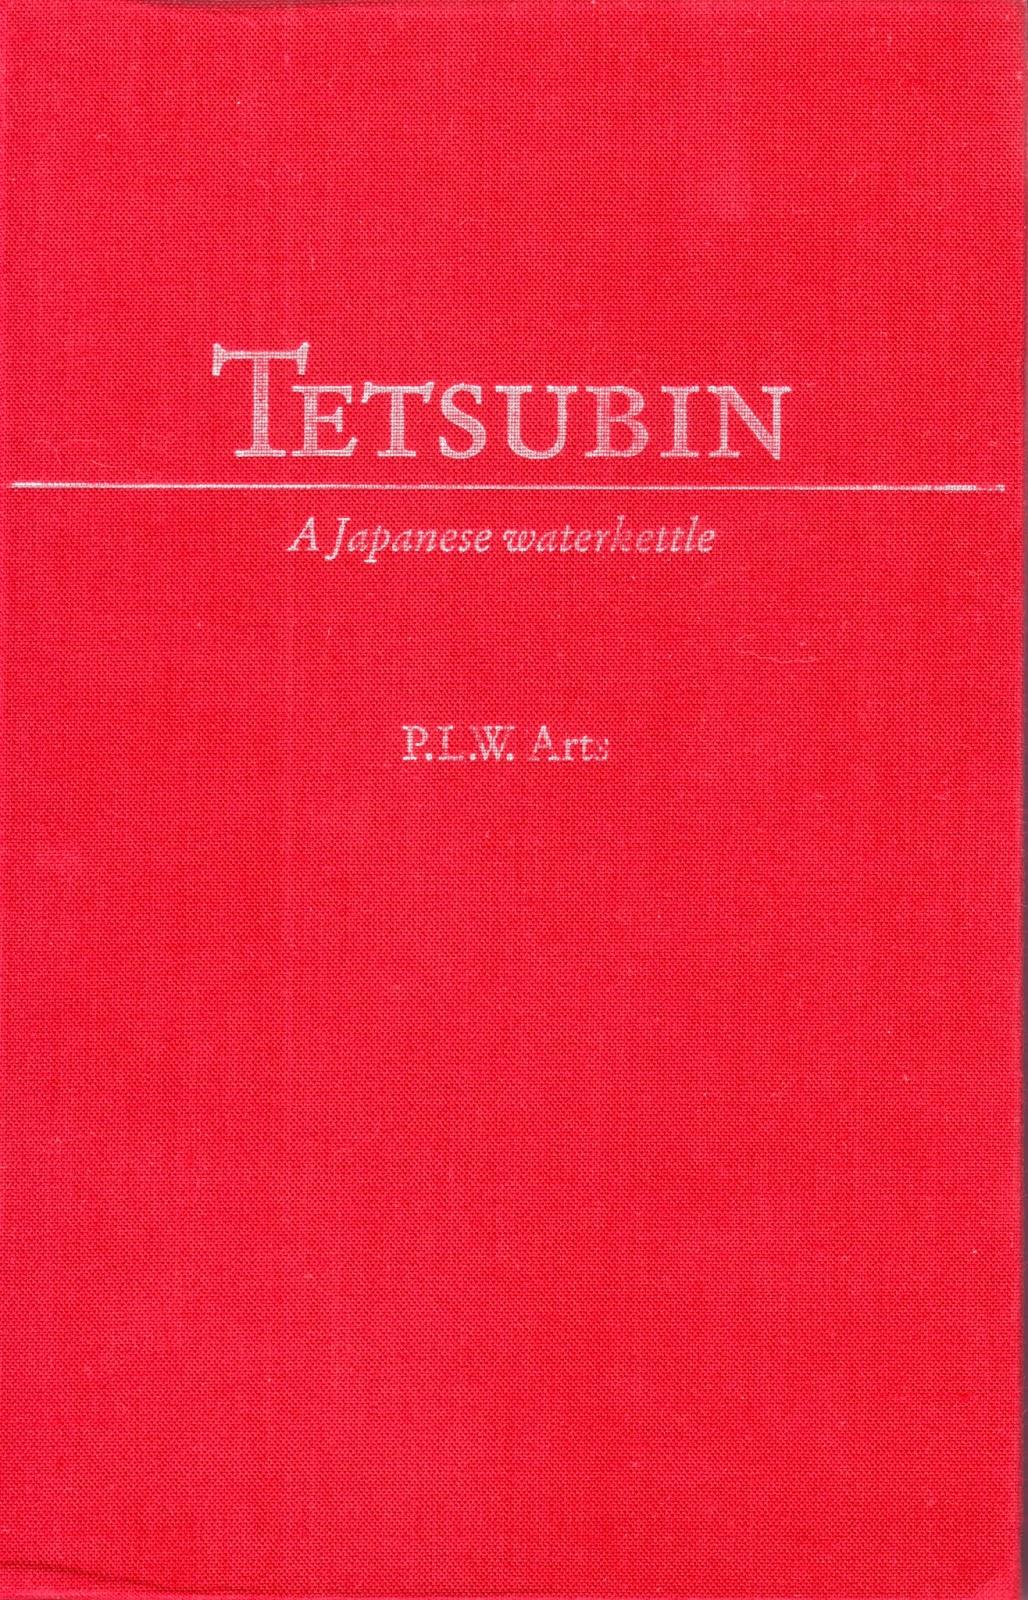 livre tetsubin P L W Arts